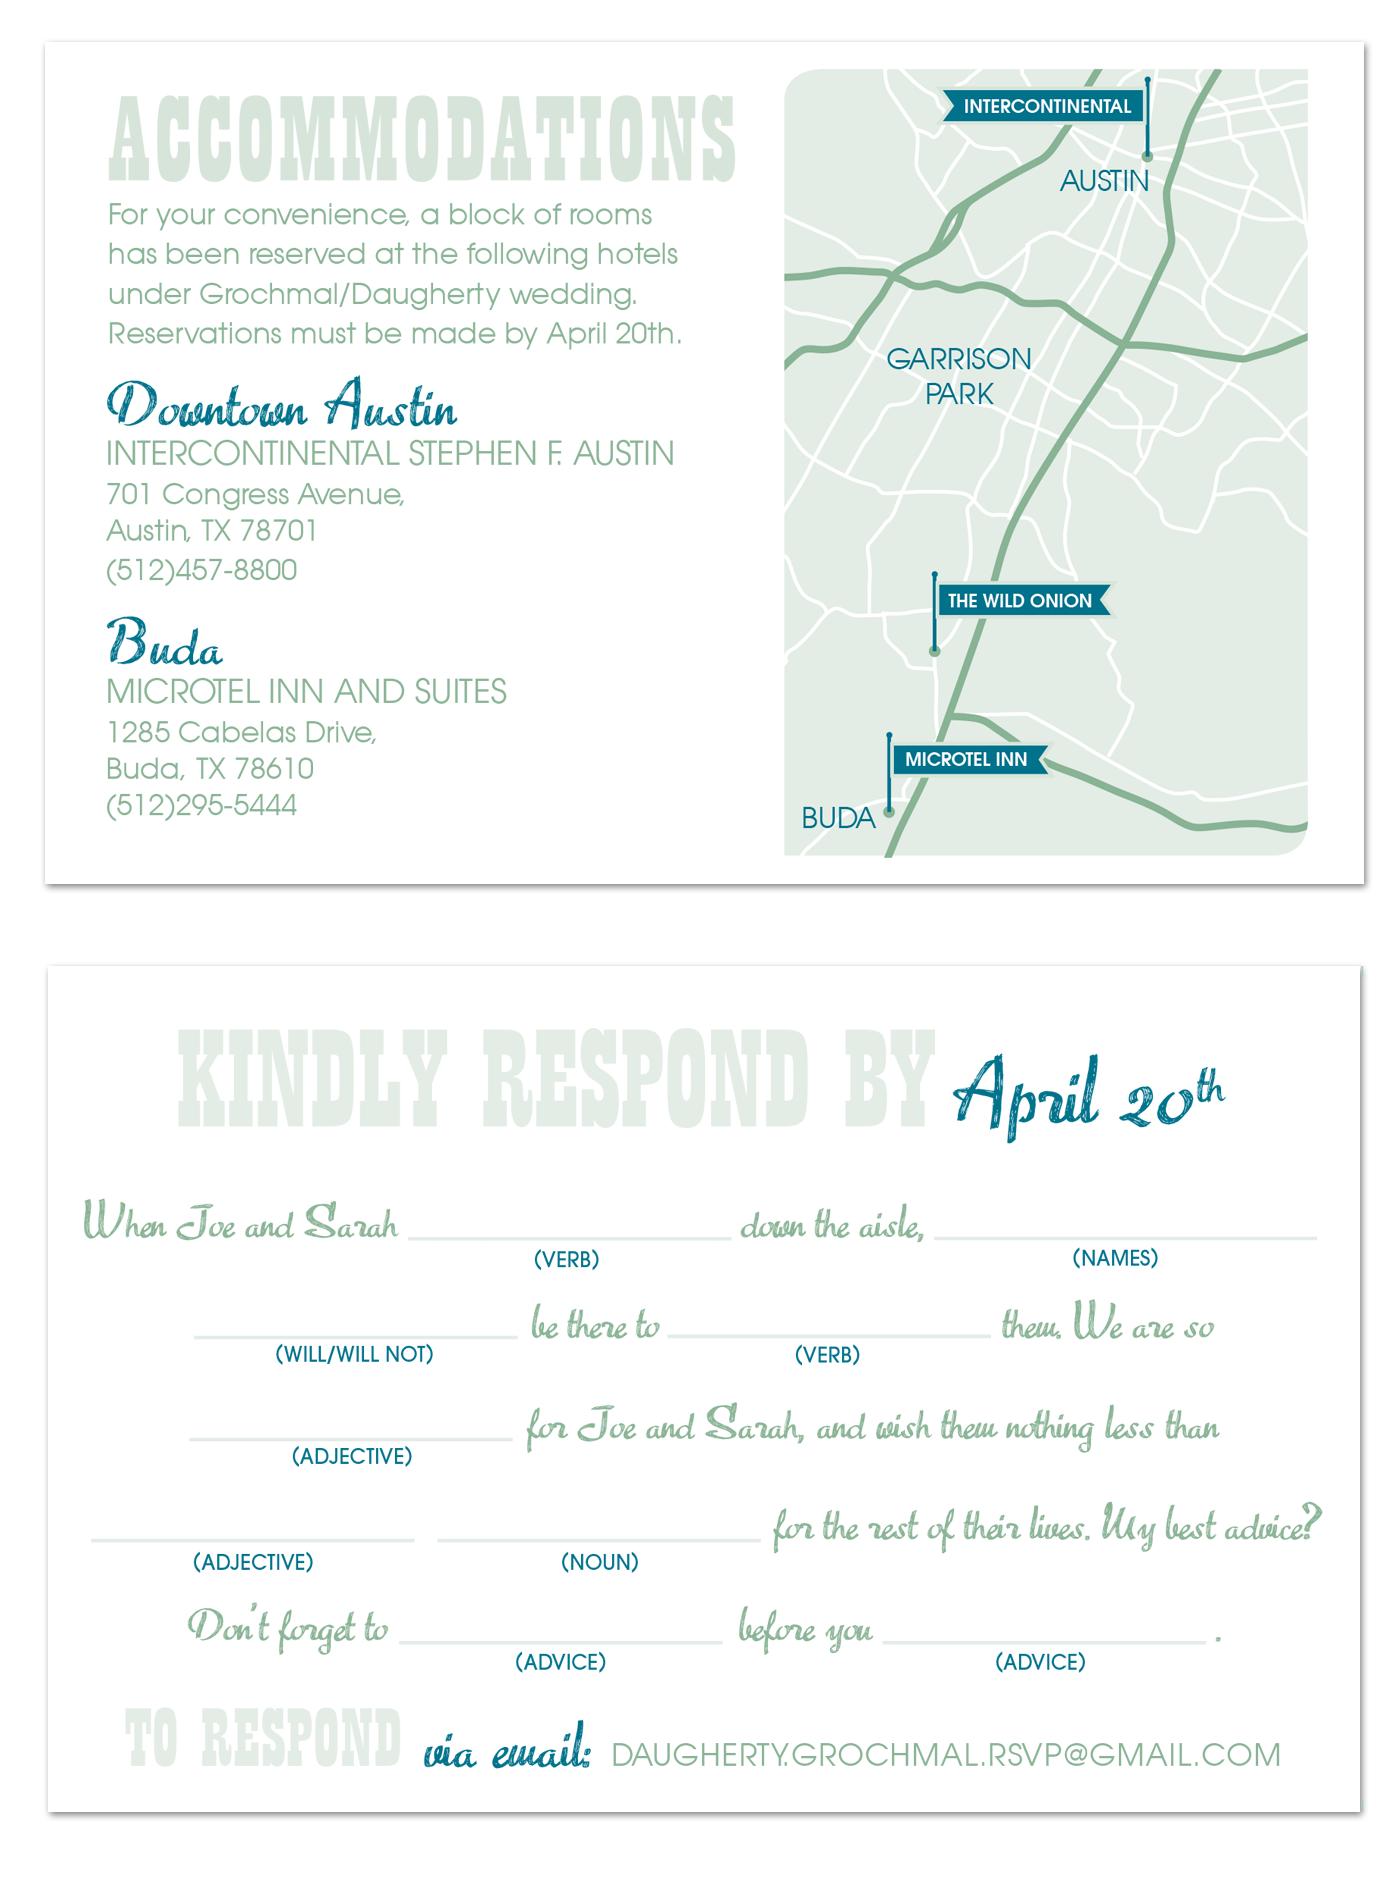 custom wedding invitations for an intimate ceremony in austin tx - Wedding Invitations Austin Tx